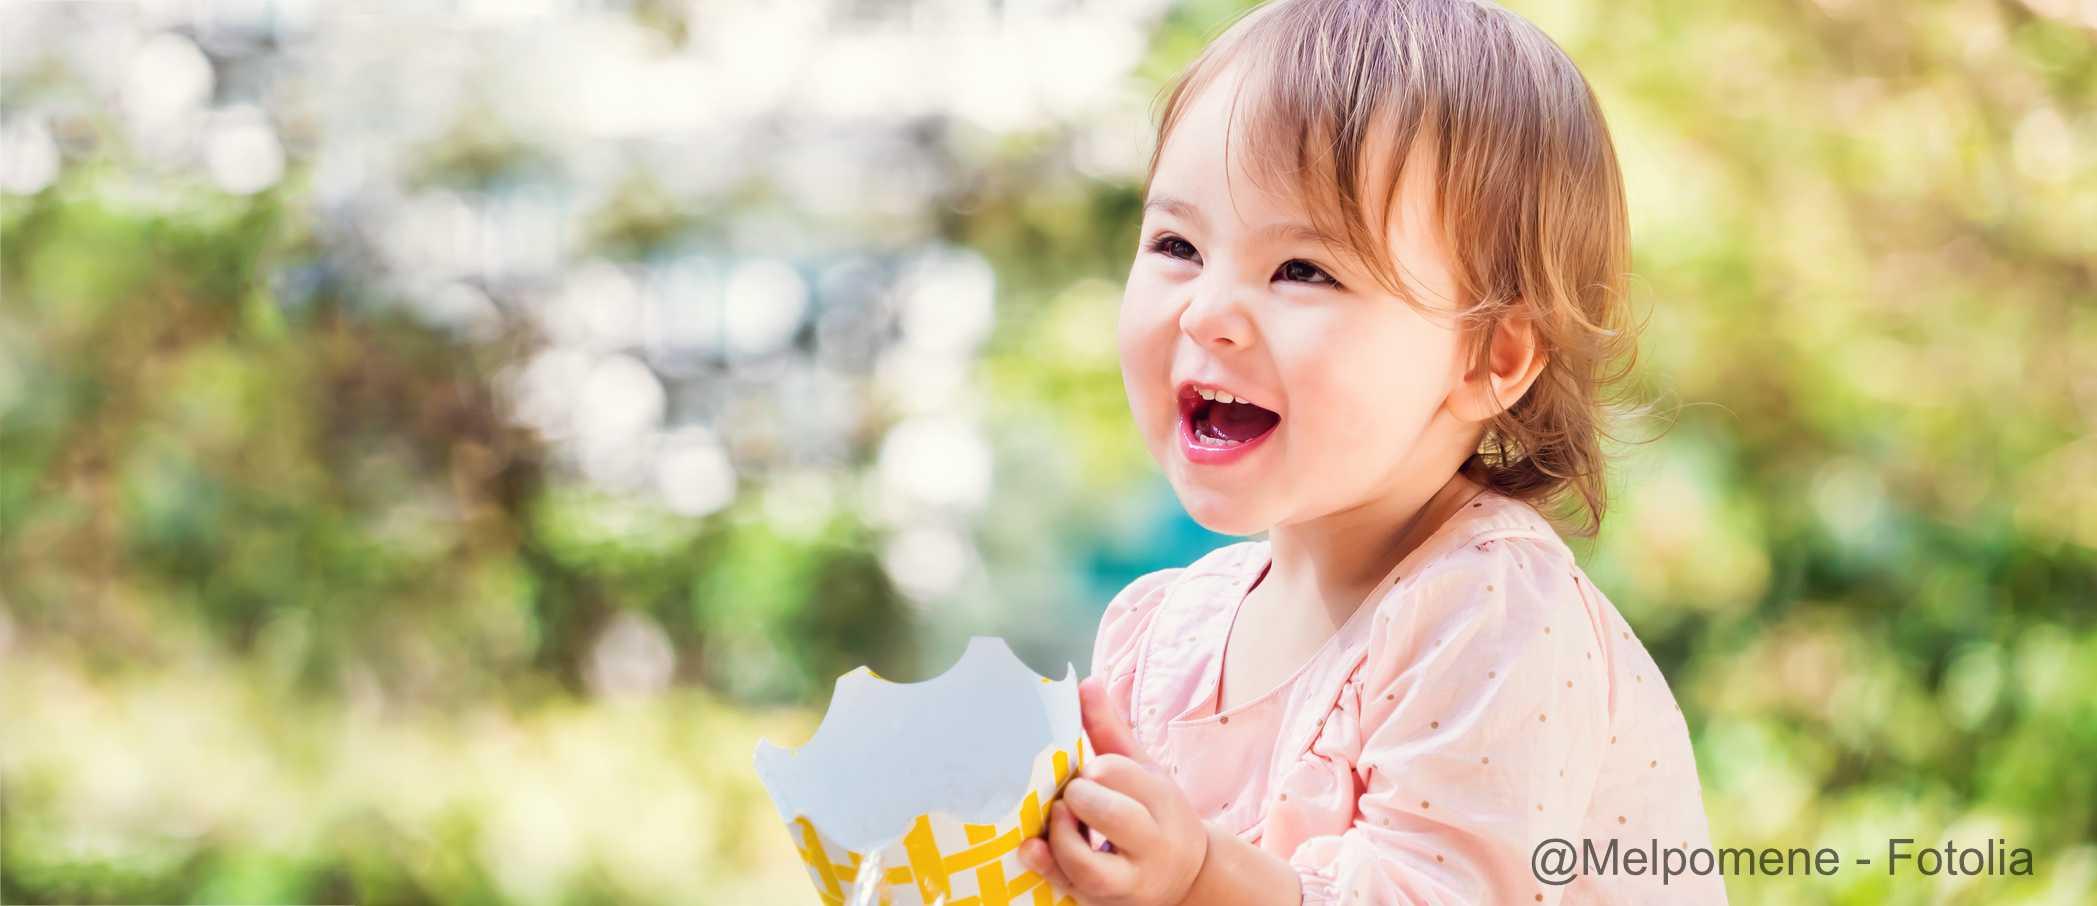 gesundes-kind-trotz-umweltgiften